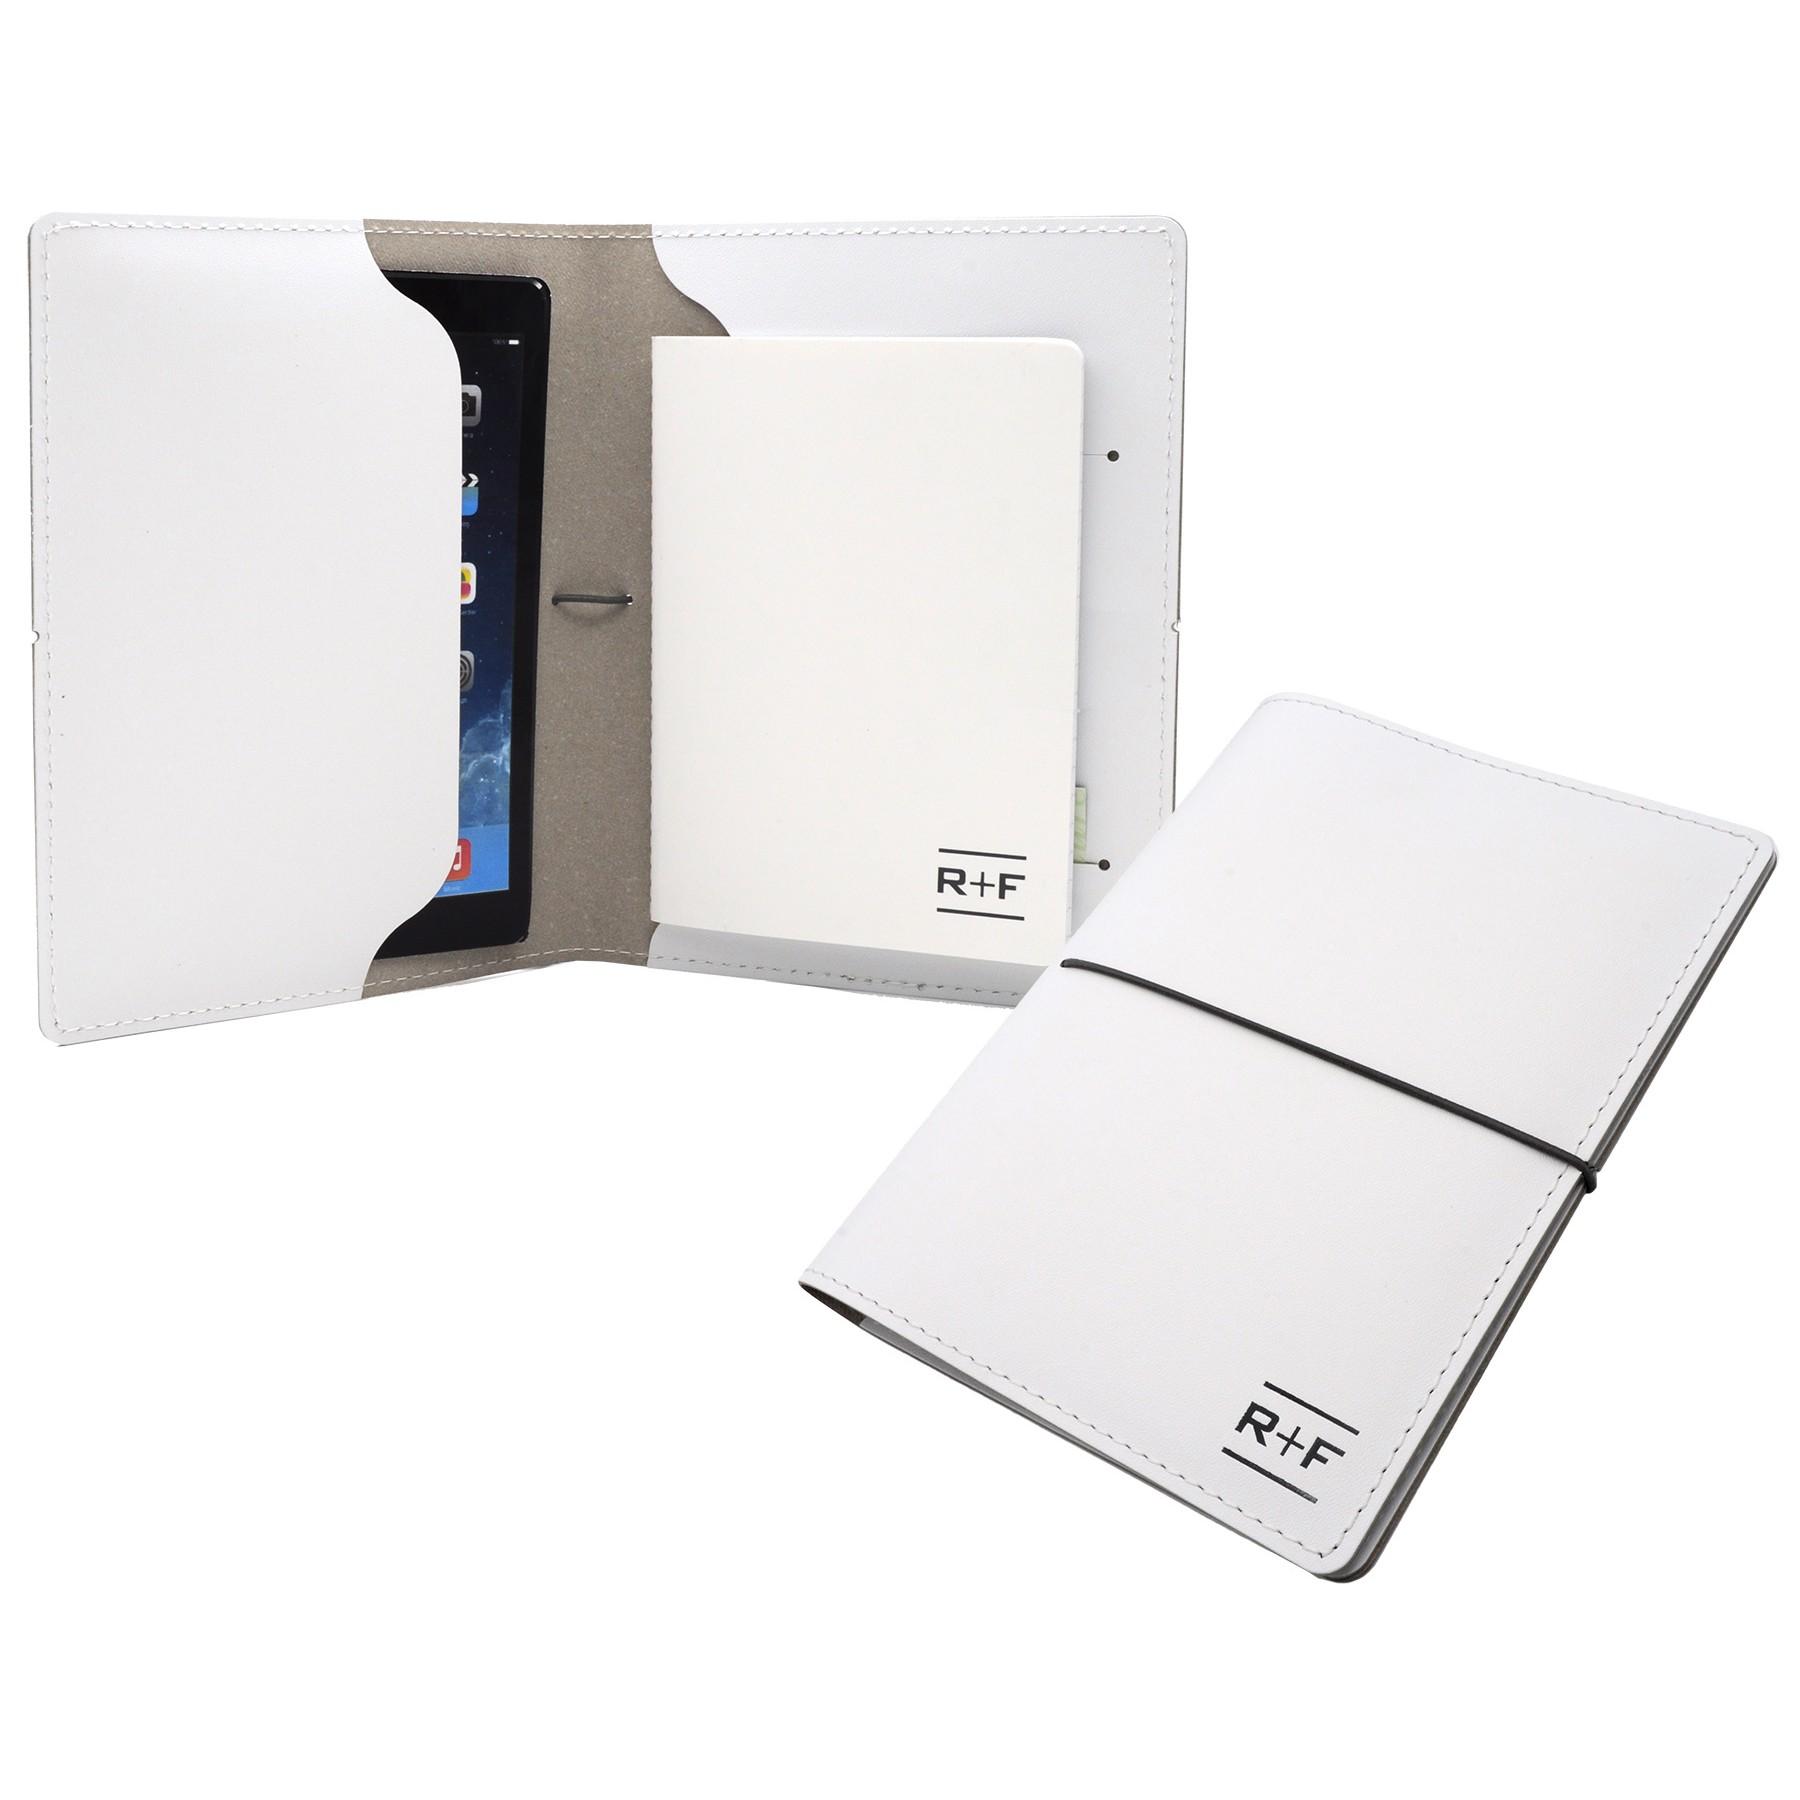 KCVR-IP - Tech Mini Ipad Slip-in Refillable Journal